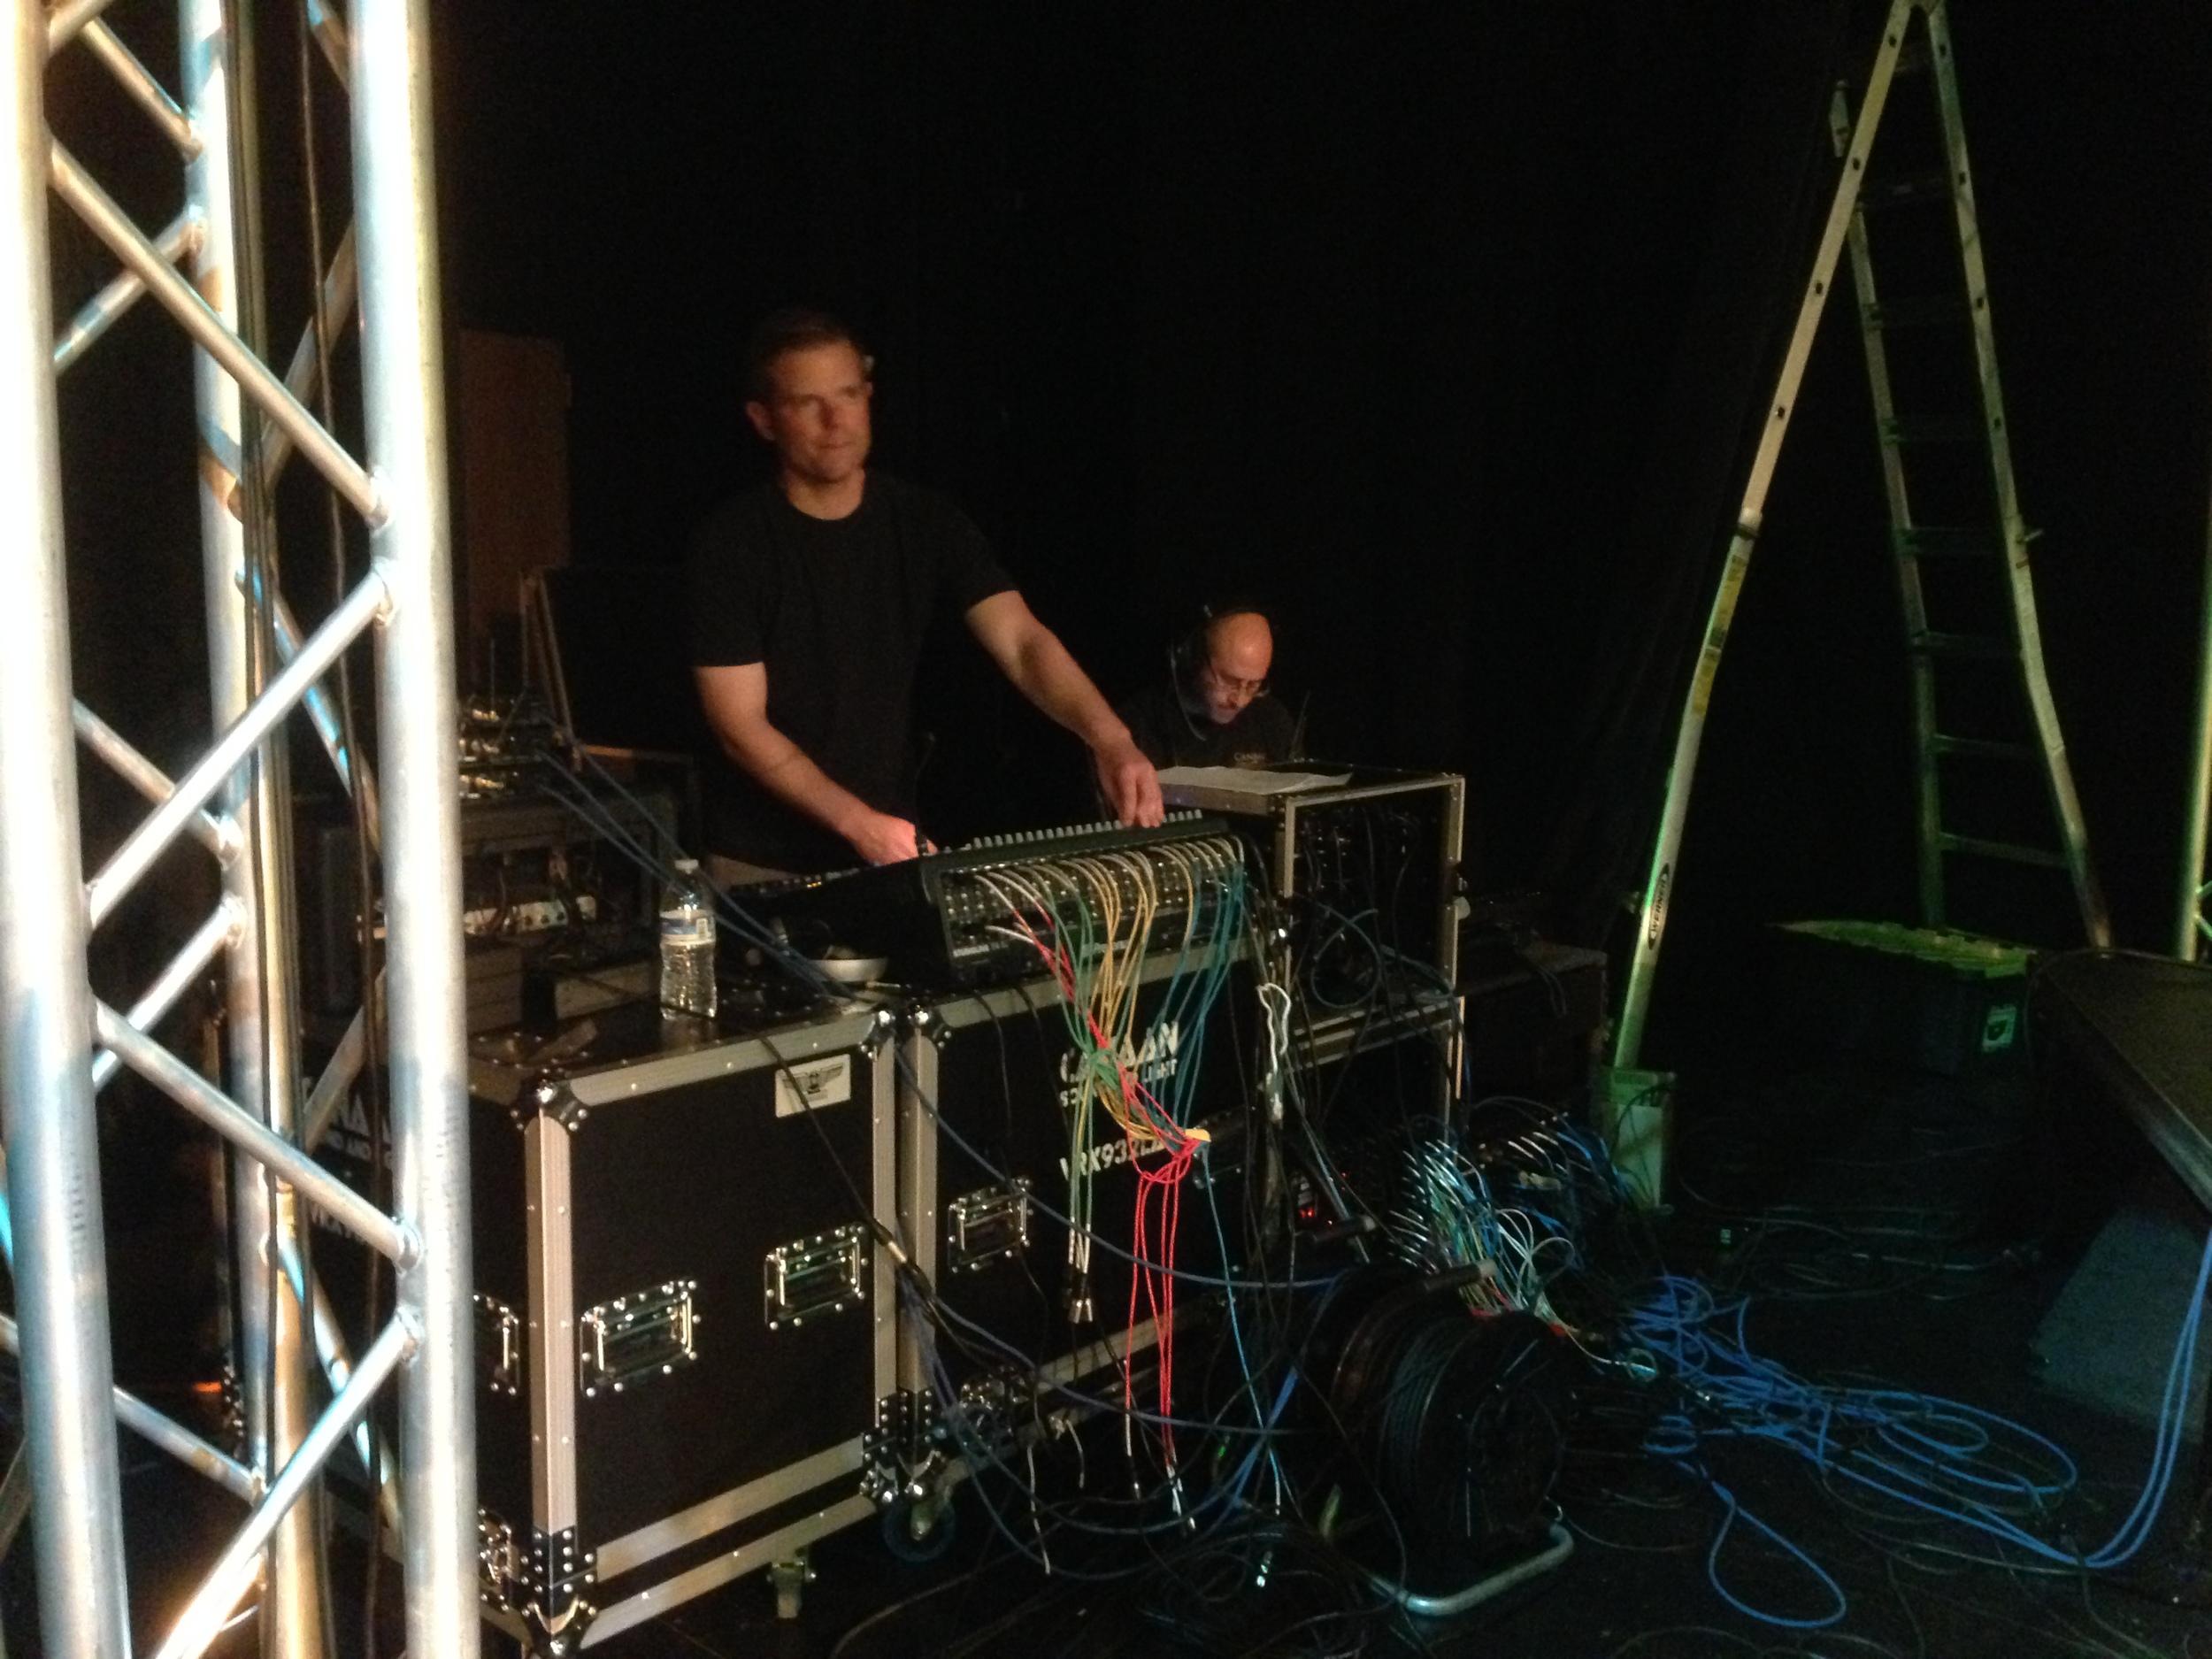 Dan on their PreSonus mixing monitors. Mike on the lighting controller.